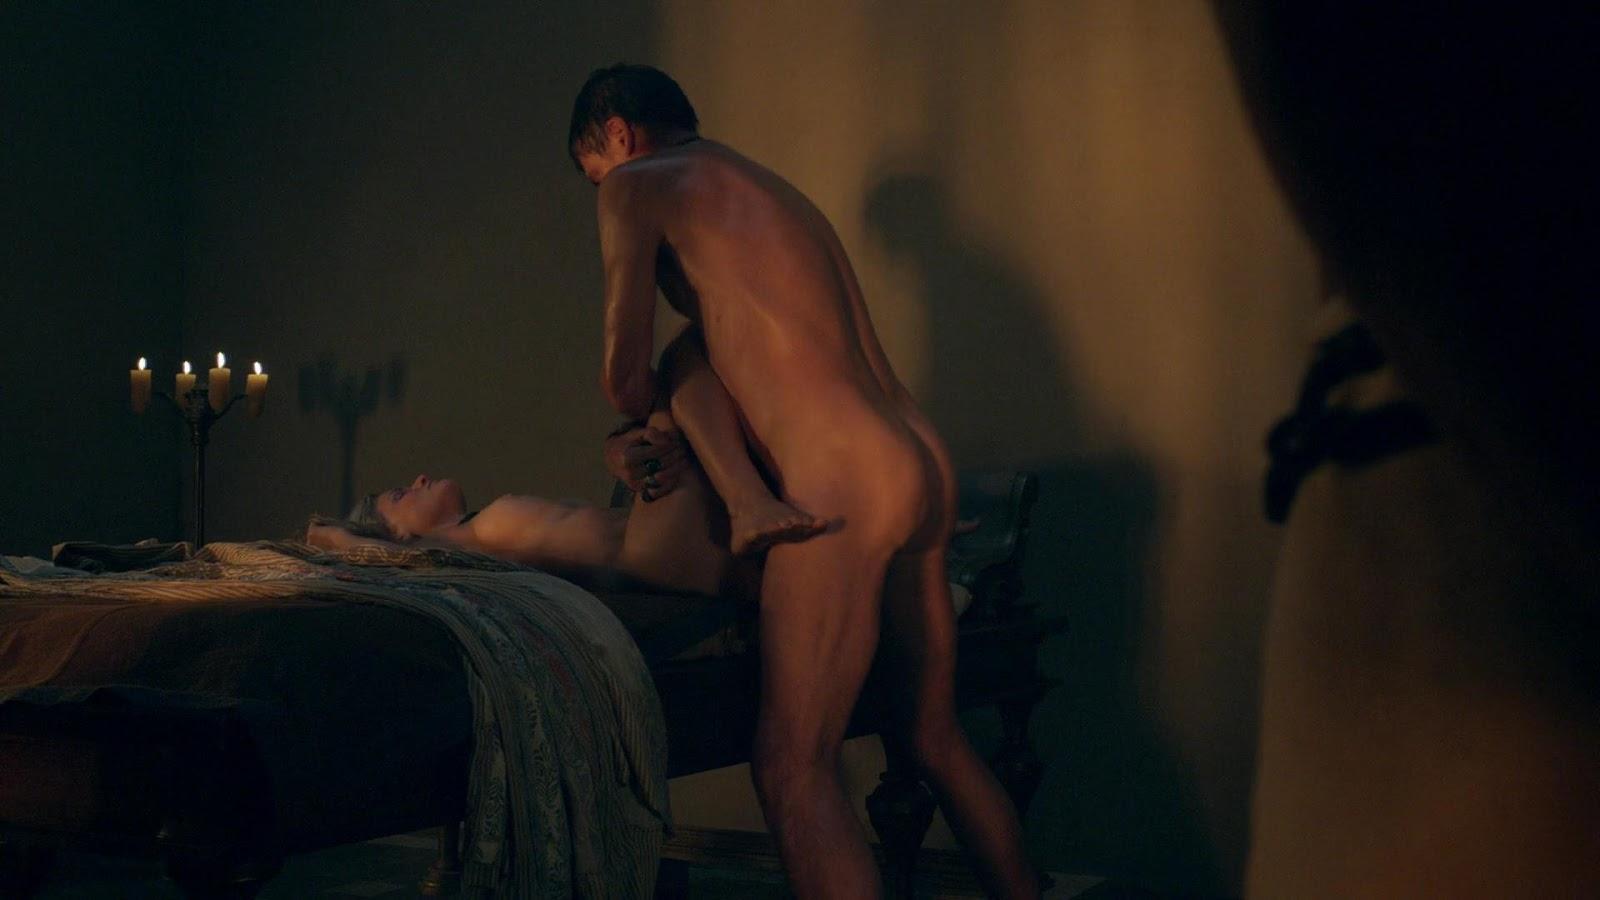 Nuneaton sex